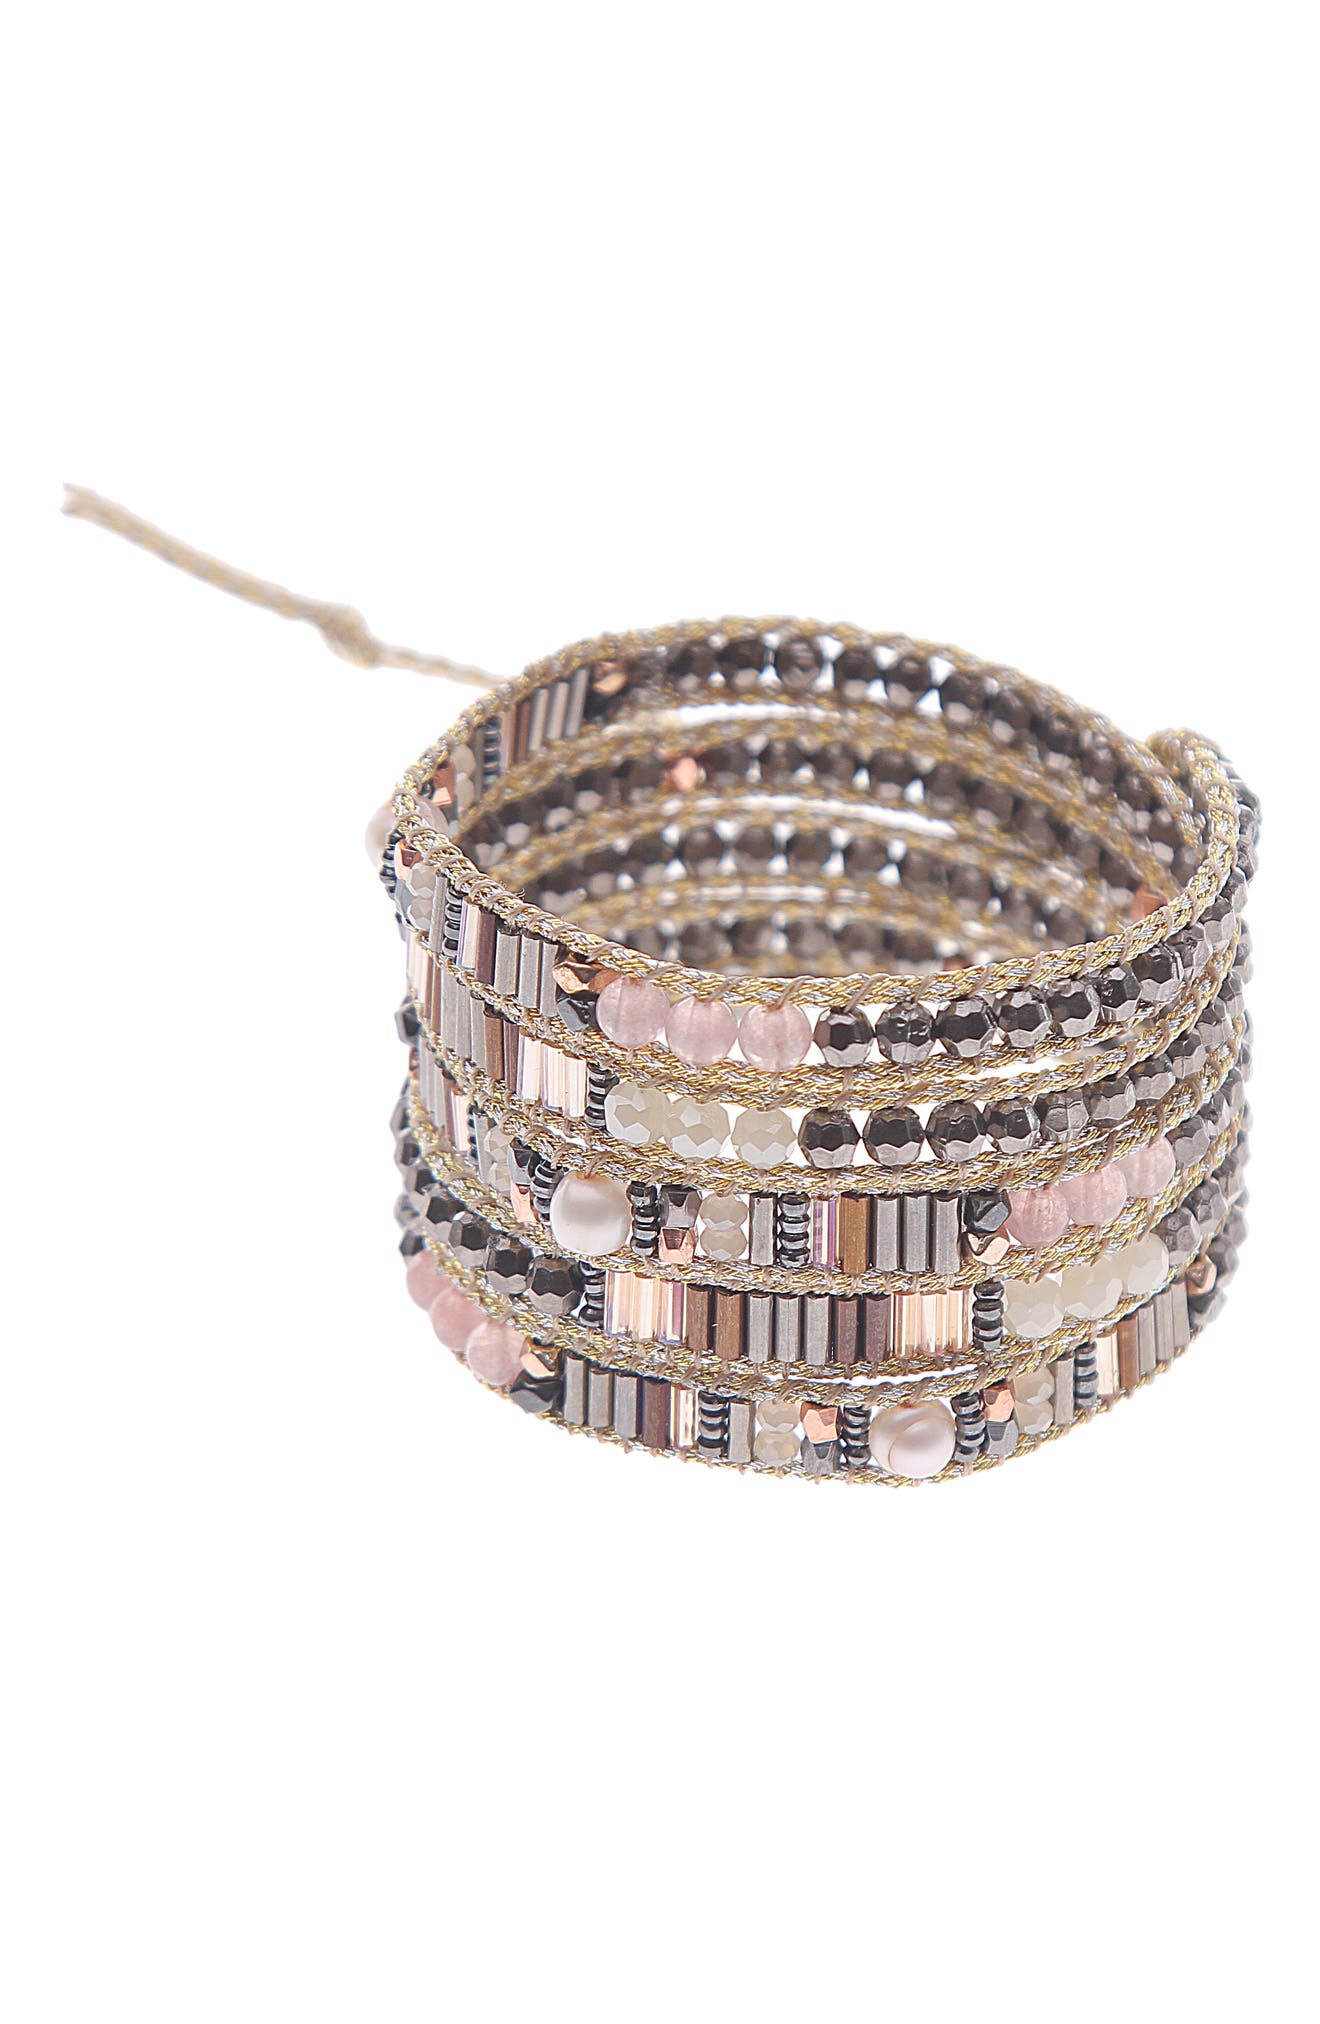 Crystal Beaded Wrap Bracelet,                             Main thumbnail 1, color,                             Gunmetal/ Creme